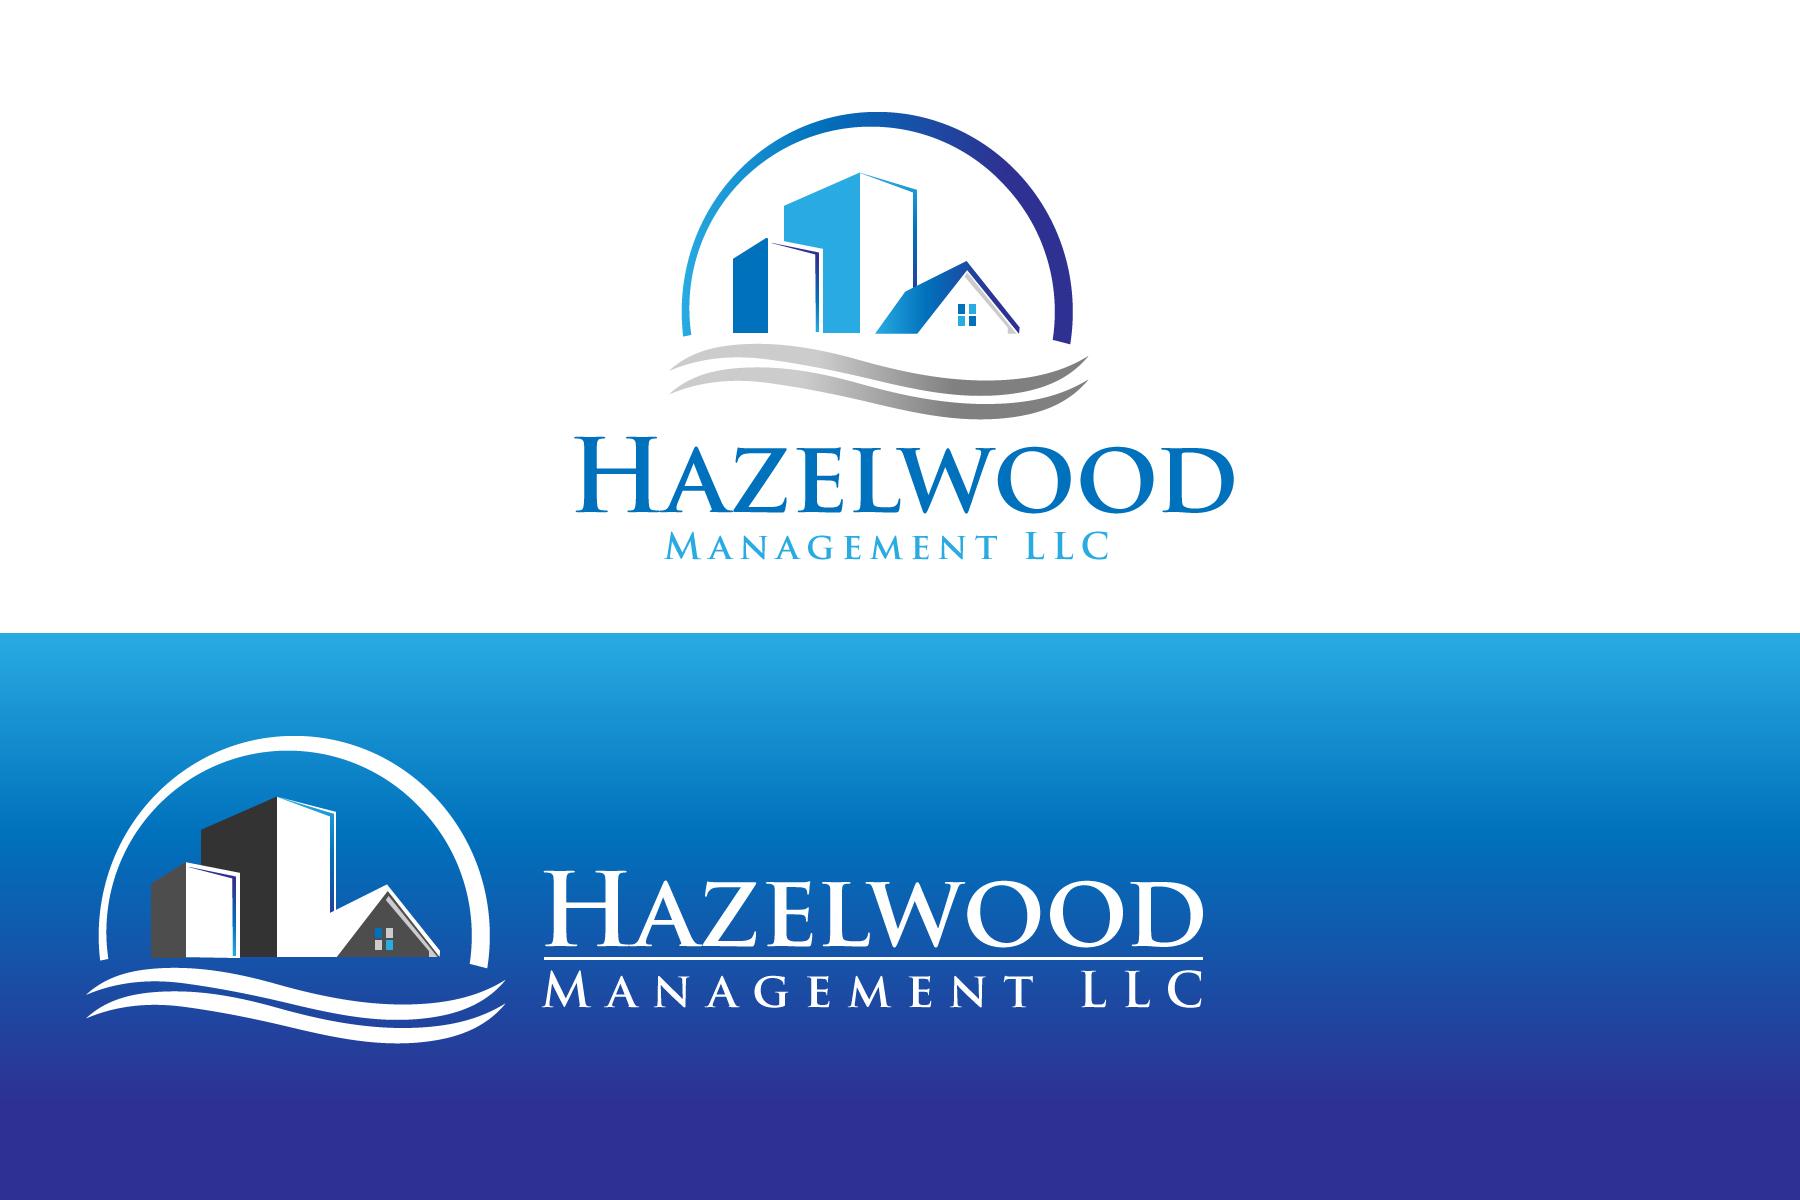 Logo Design by Jagdeep Singh - Entry No. 20 in the Logo Design Contest Hazelwood Management LLC Logo Design.